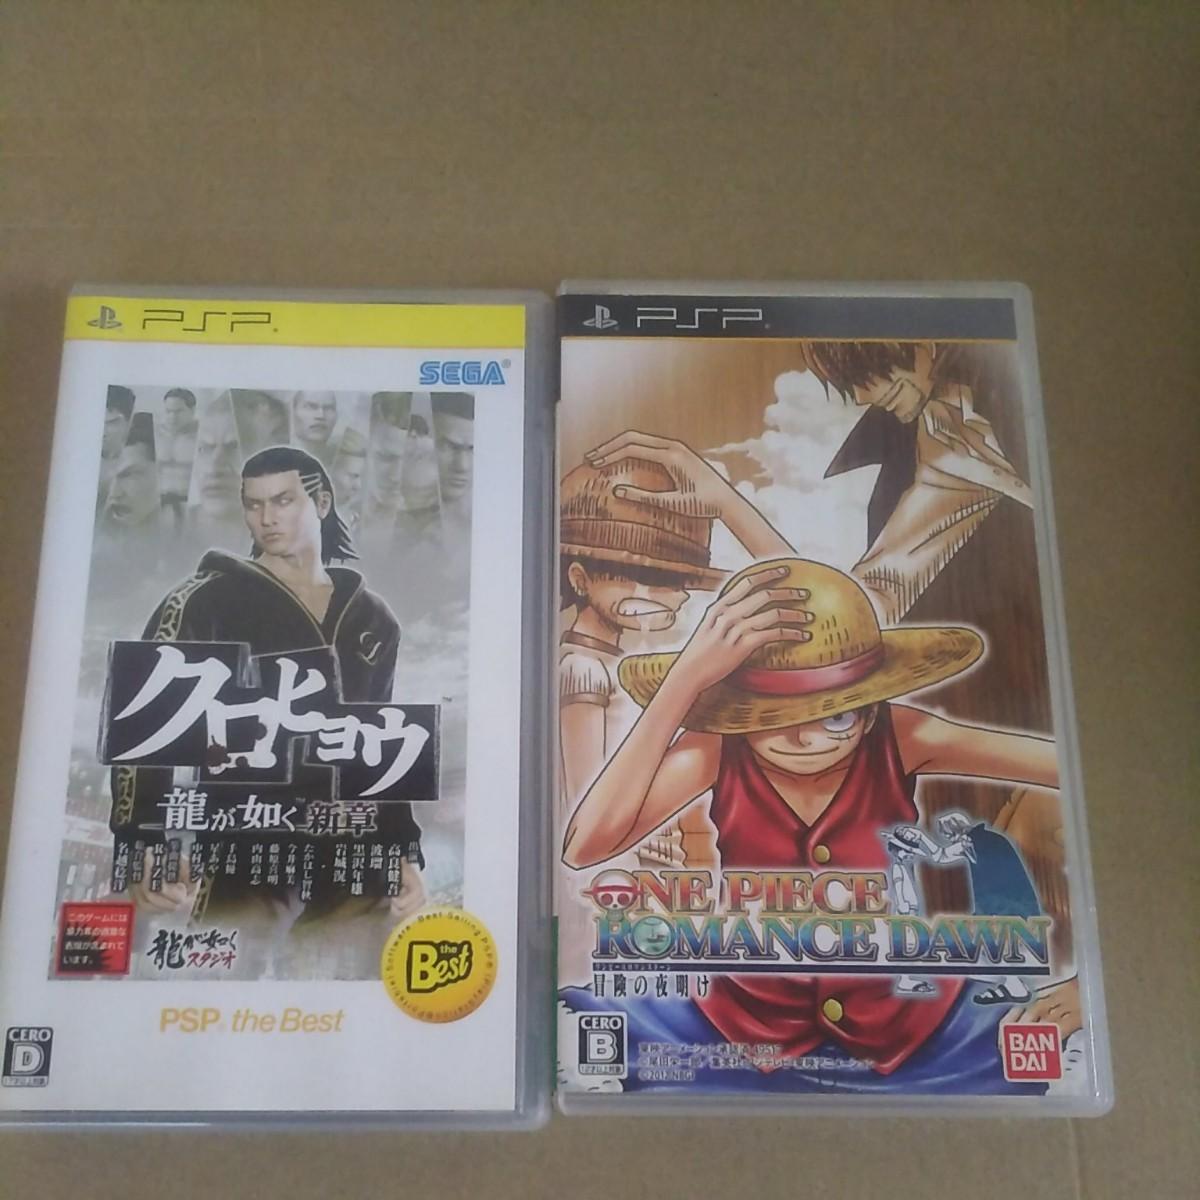 PSP クロヒョウ 龍が如く新章 PSP the Bestワンピース冒険の夜明け